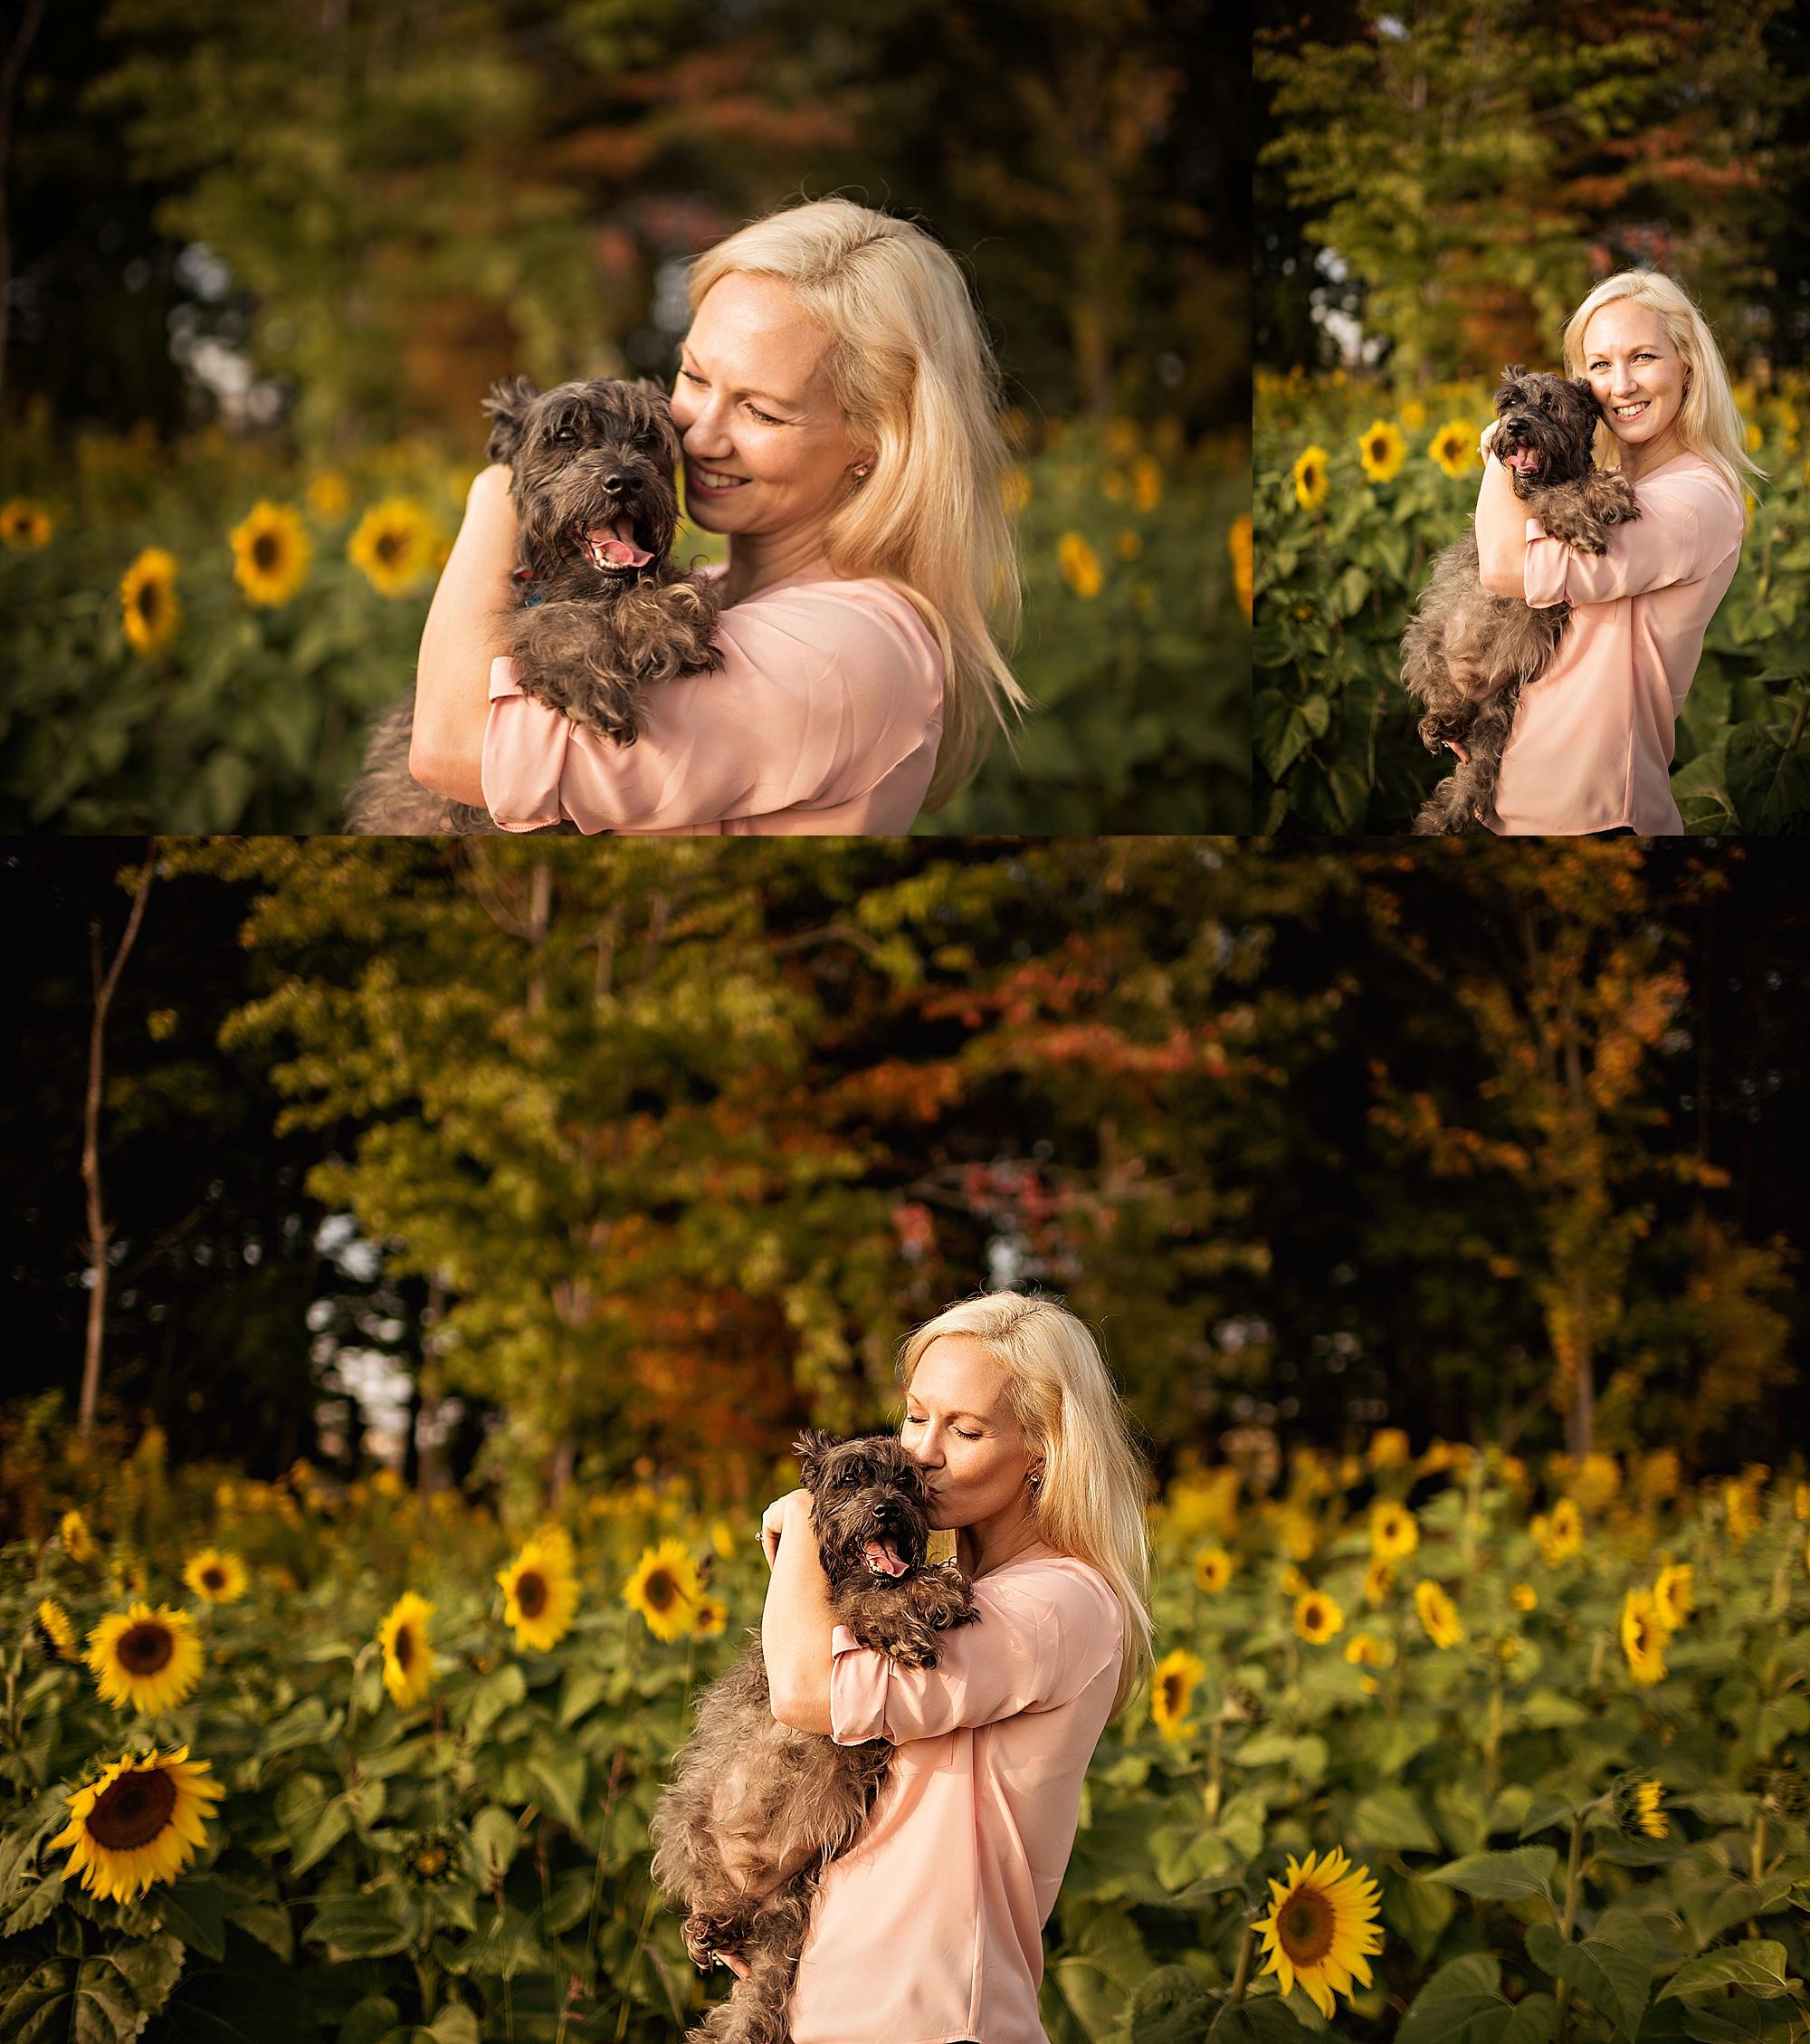 Lori-and-mike-akron-ohio-photographer-lauren-grayson-sunflower-field-session_0024.jpg